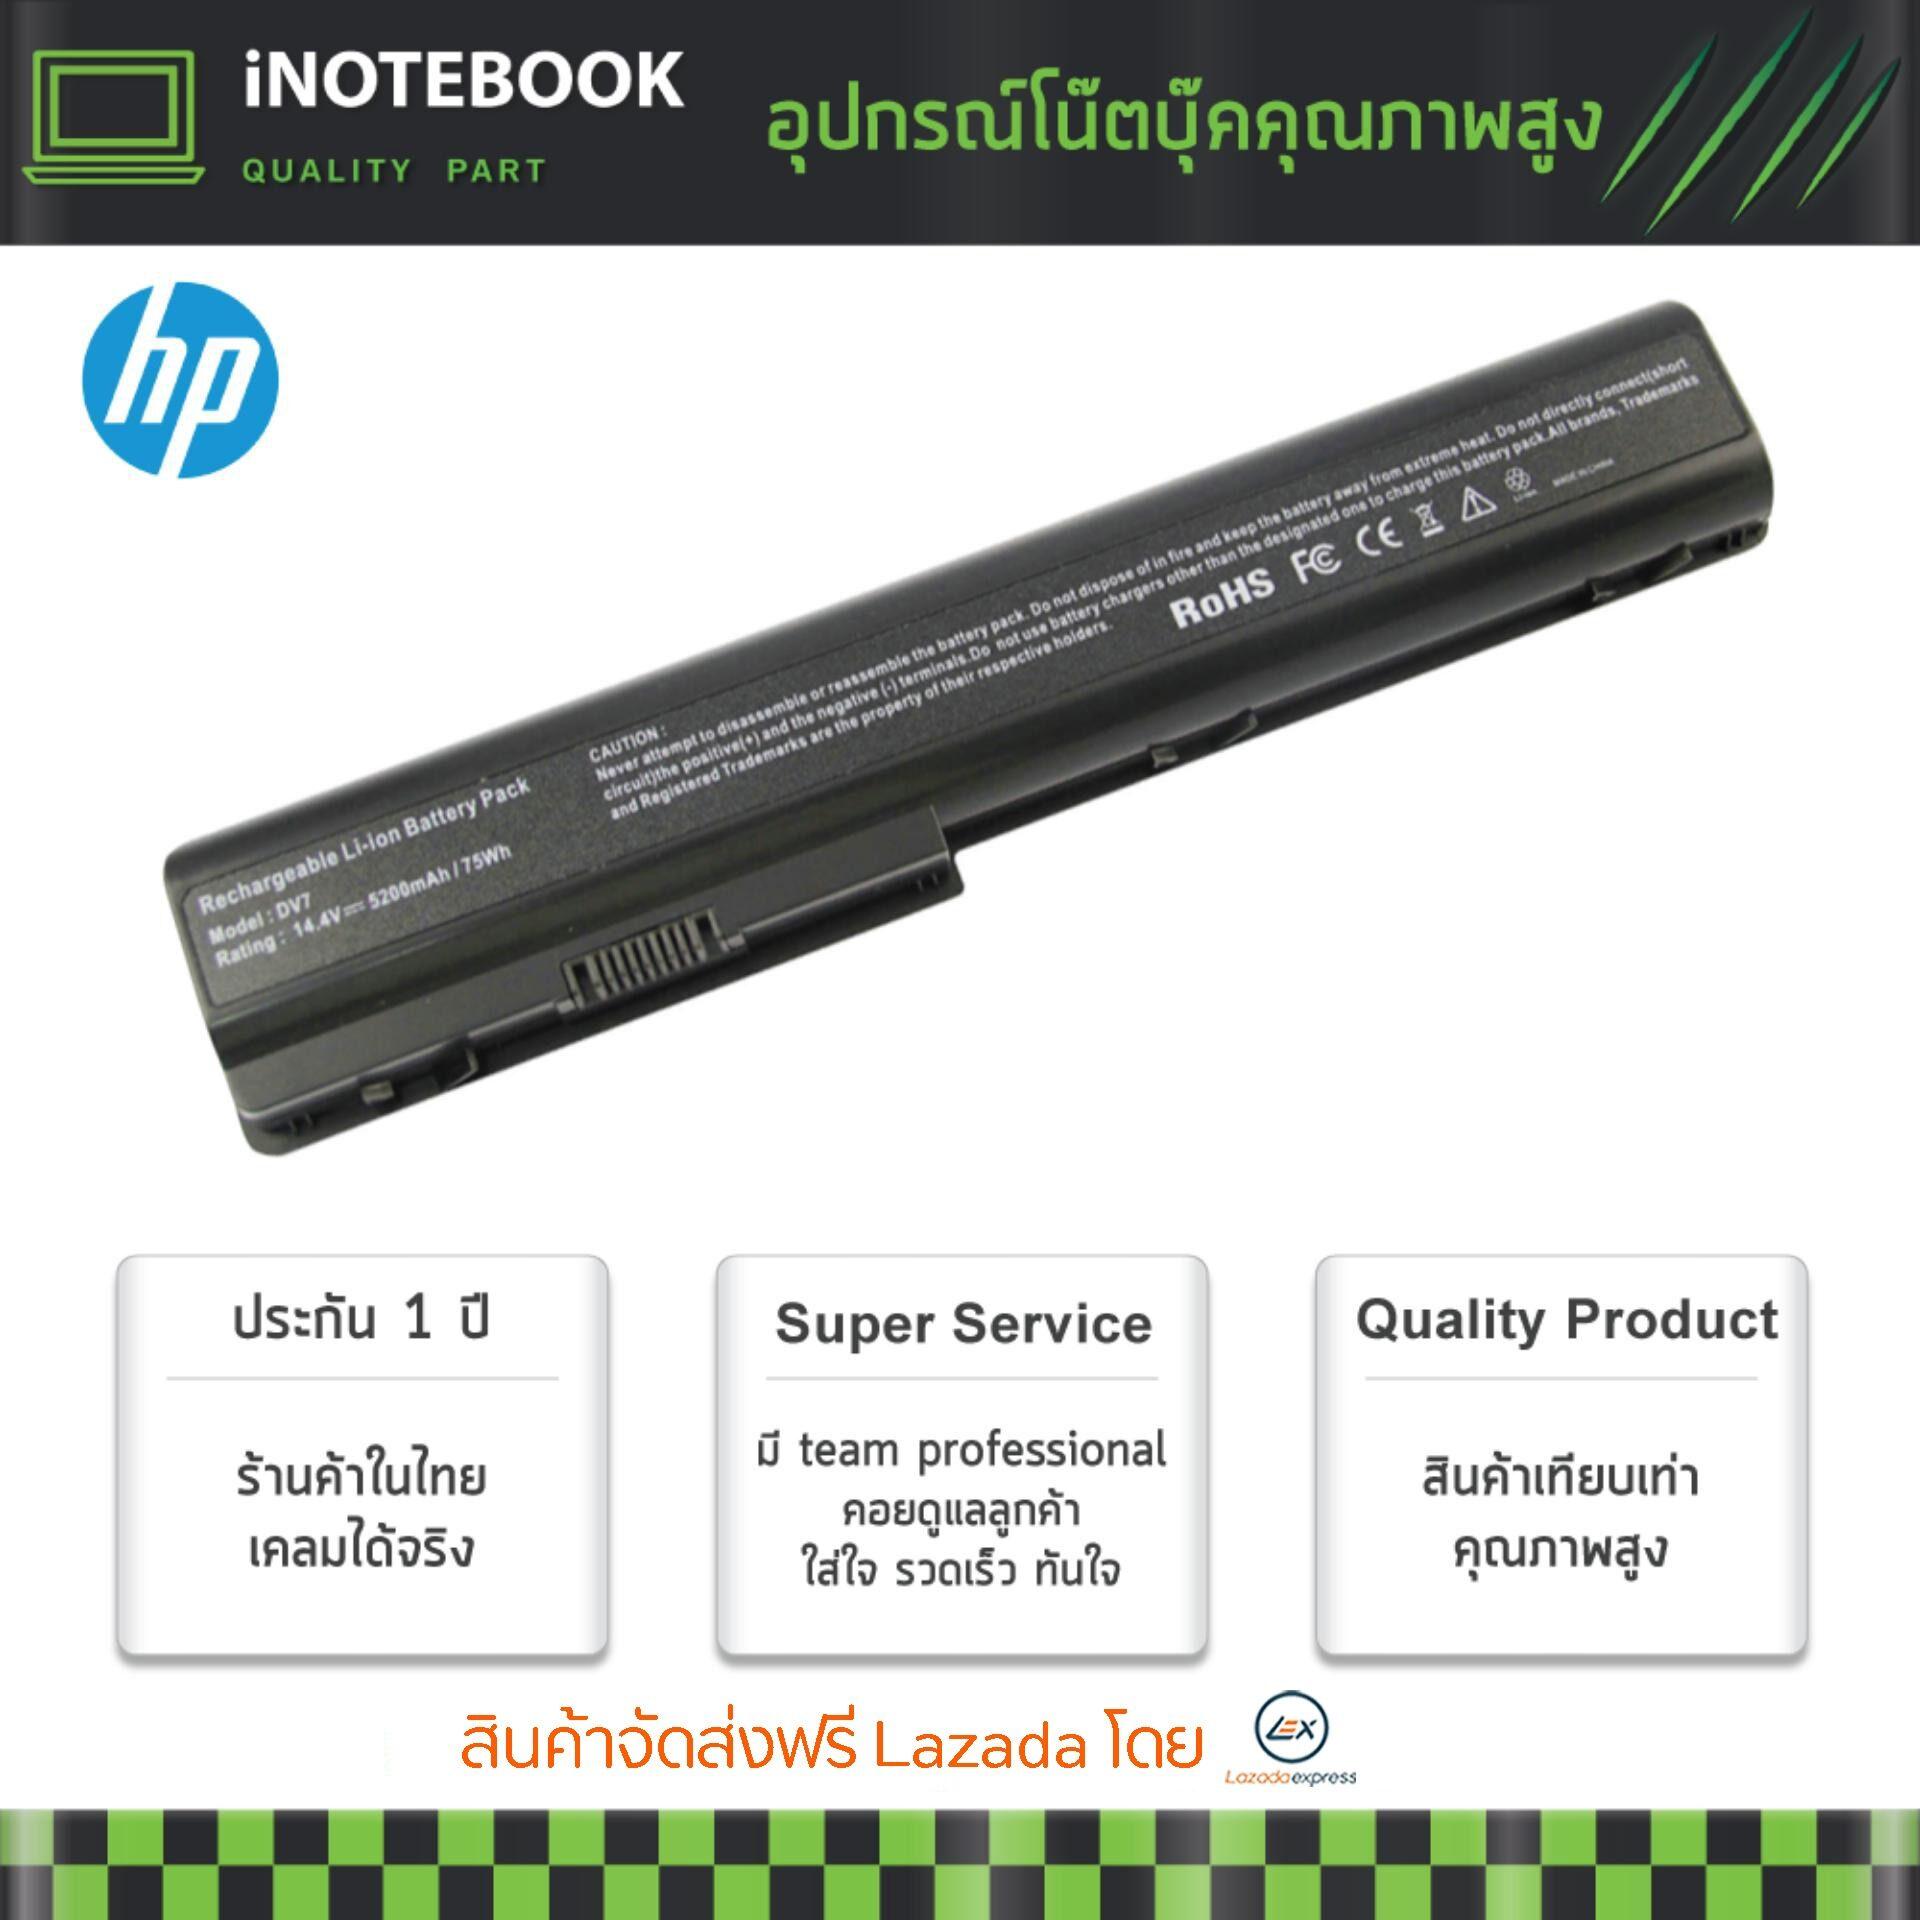 HP แบตเตอรี่โน๊ตบุ๊ค Battery Notebook รุ่น HP Pavilion dv7 series(HP Pavilion DV7, DV7-1000, DV7-1100, DV7-3067NR / HP HDX18 Series และอีกหลายรุ่น)